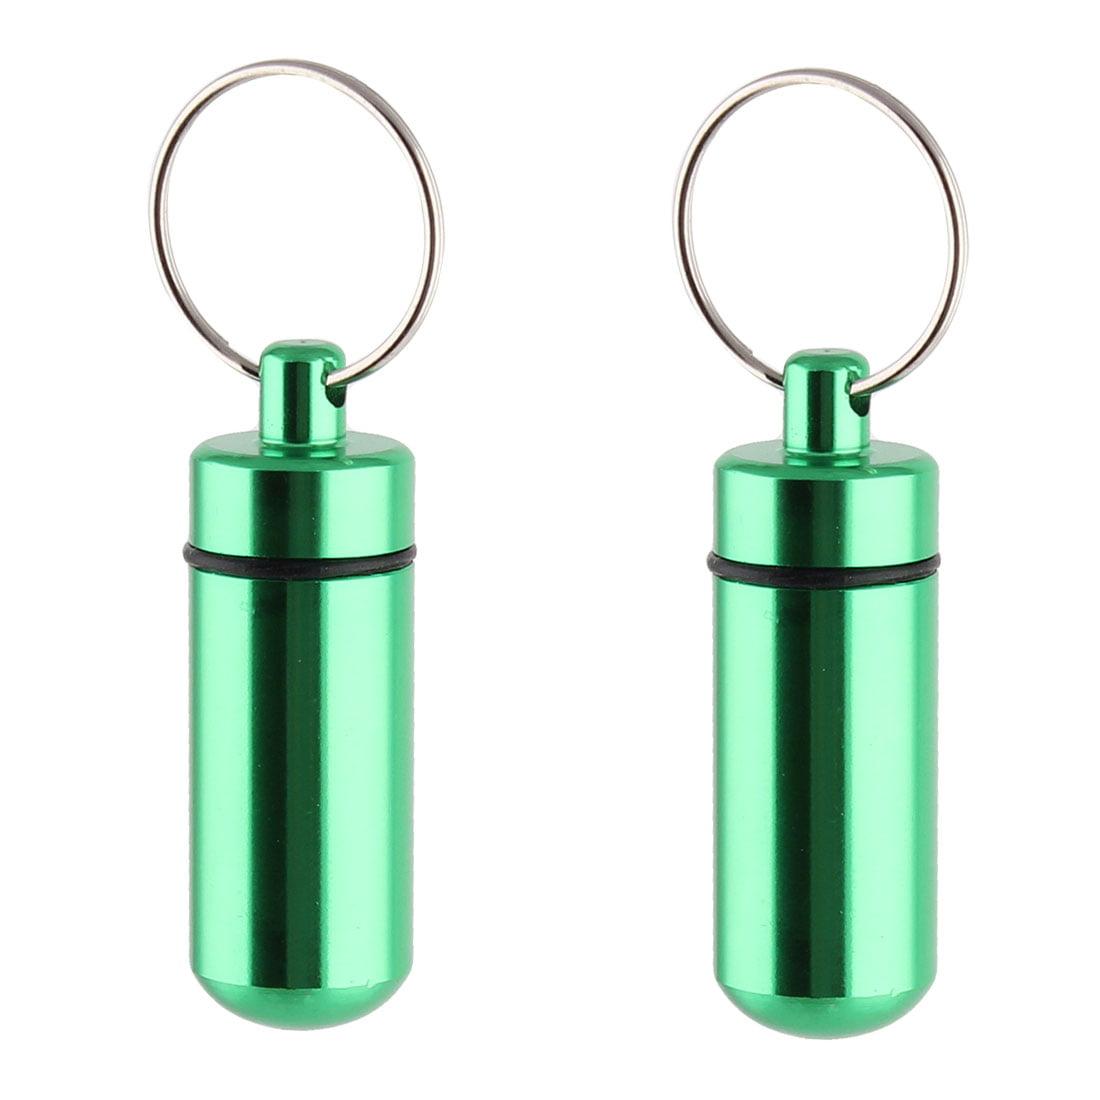 Aluminum Alloy Portable Pill Tablet Case Box Holder Keyring Keychain Green 2pcs